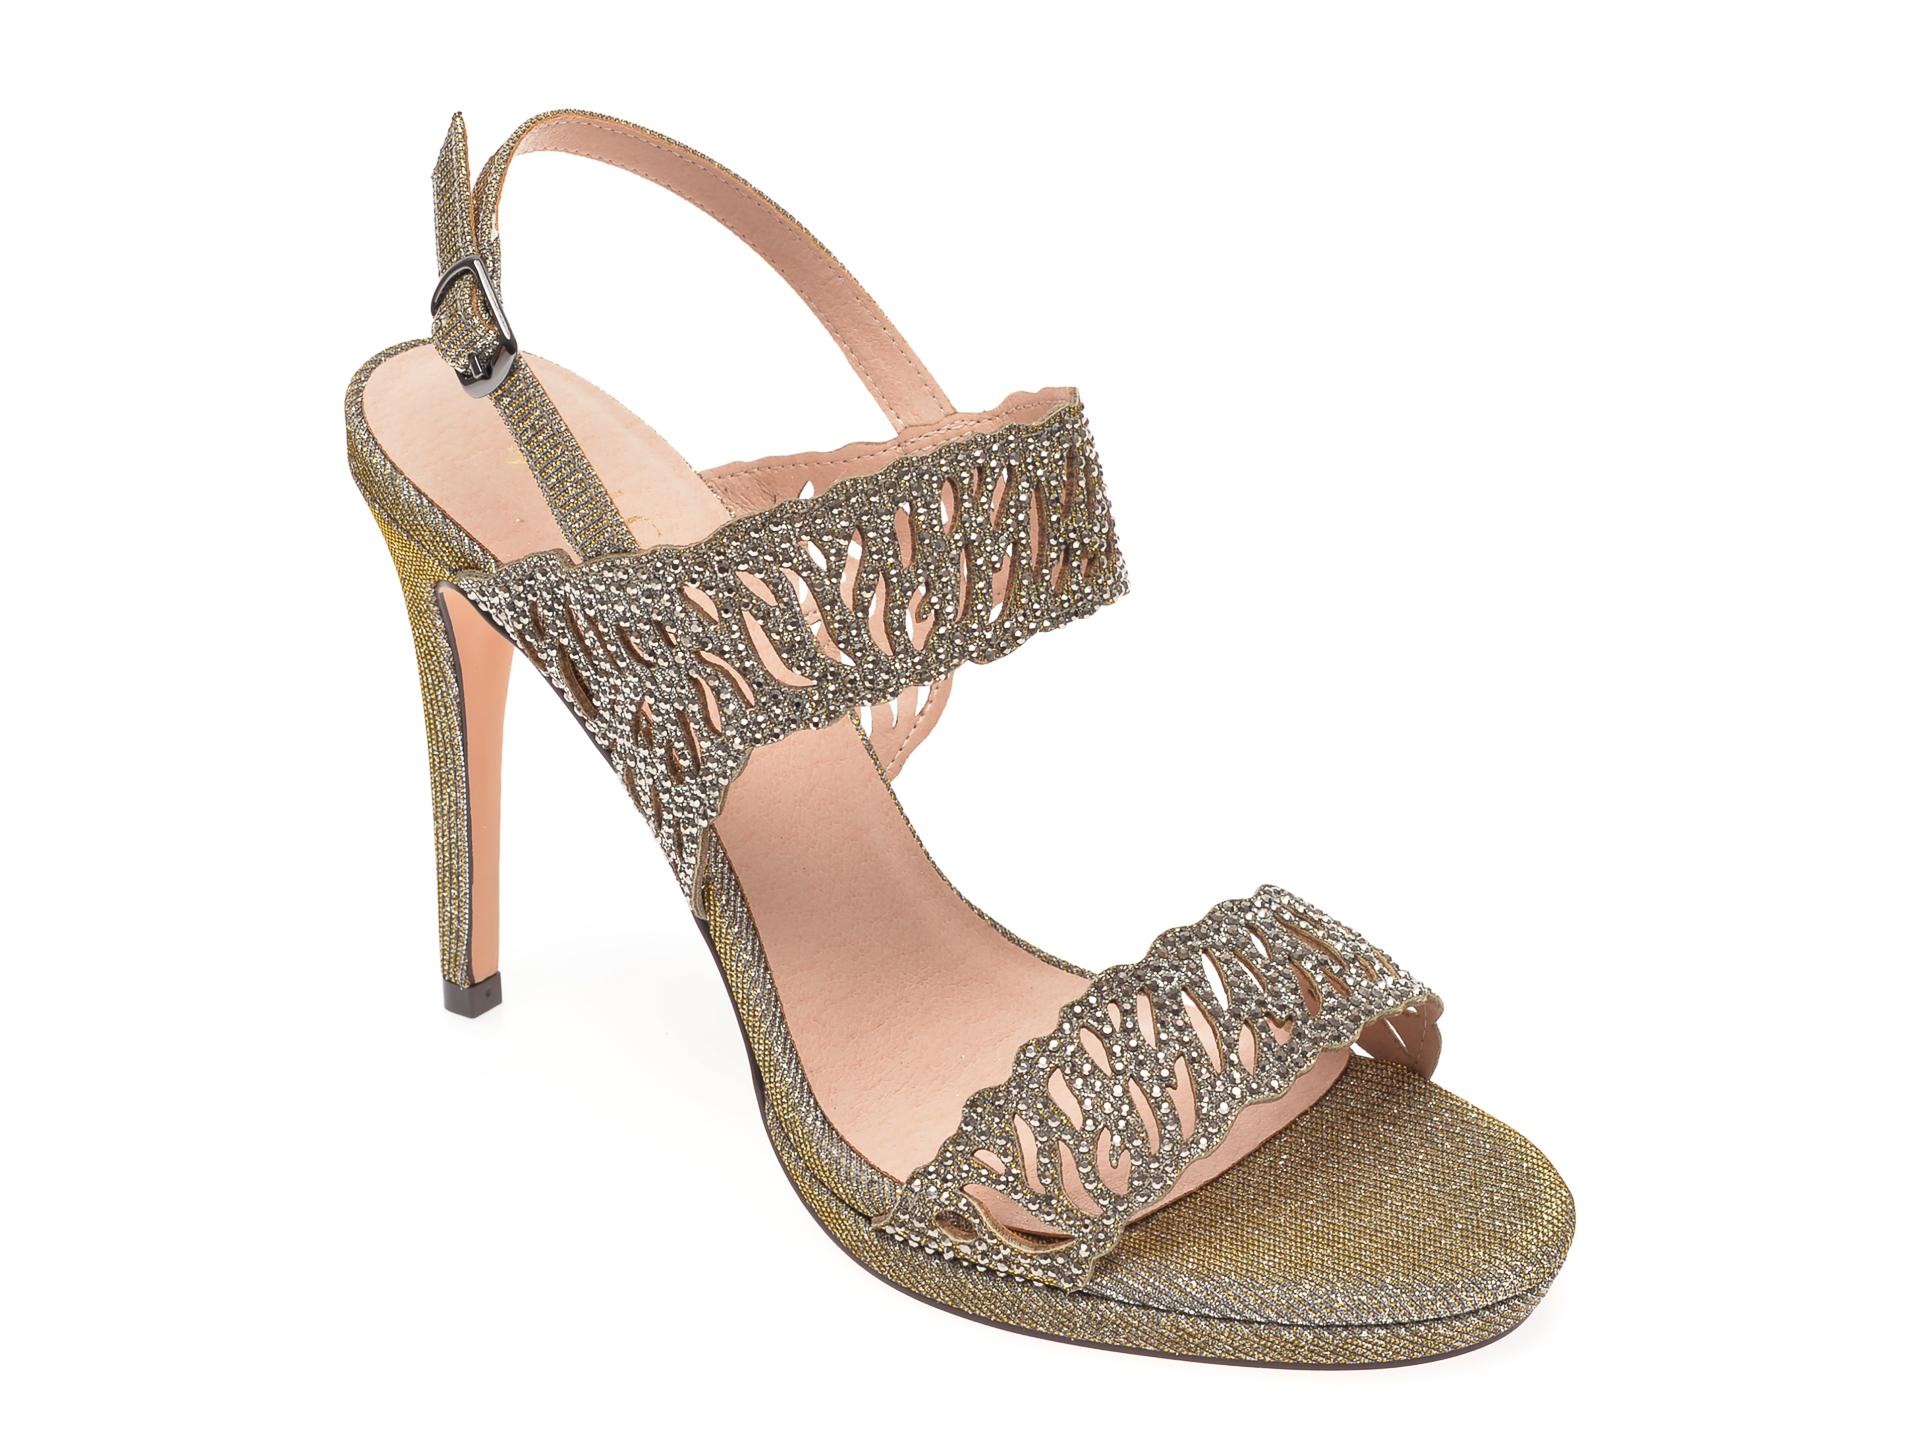 Sandale MENBUR aurii, 20862, din piele ecologica imagine otter.ro 2021